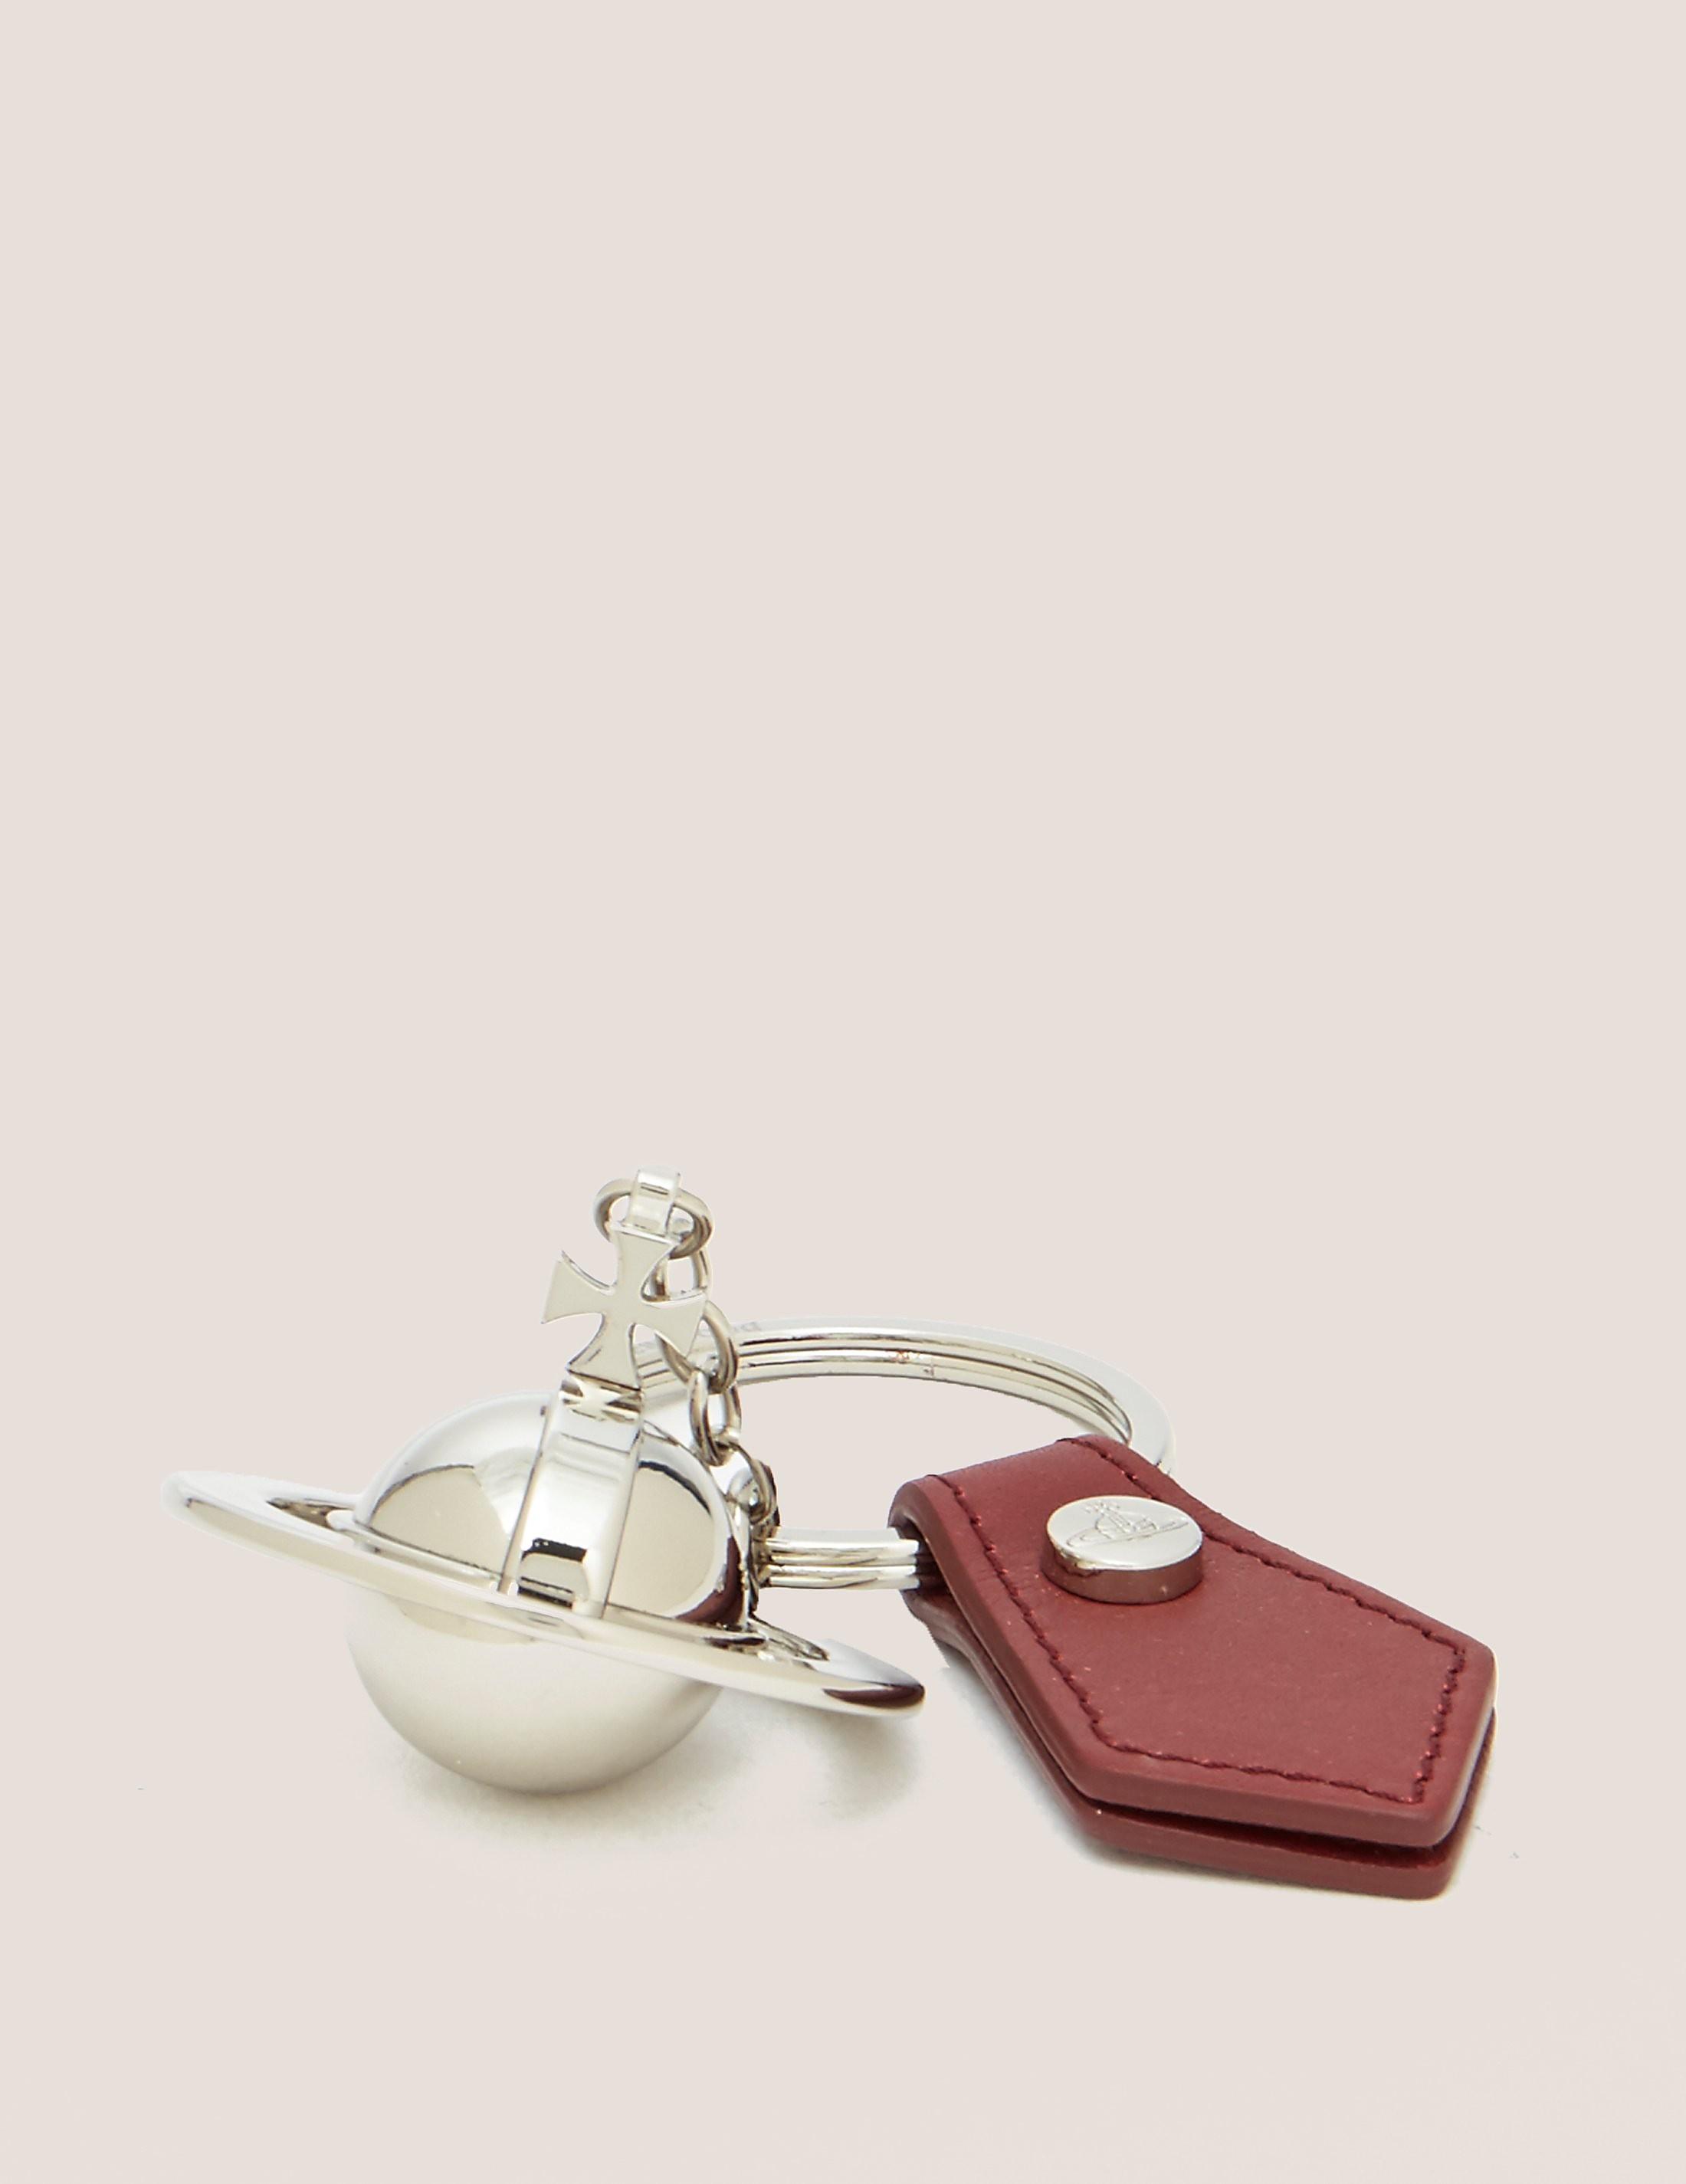 Vivienne Westwood Orb Keychain